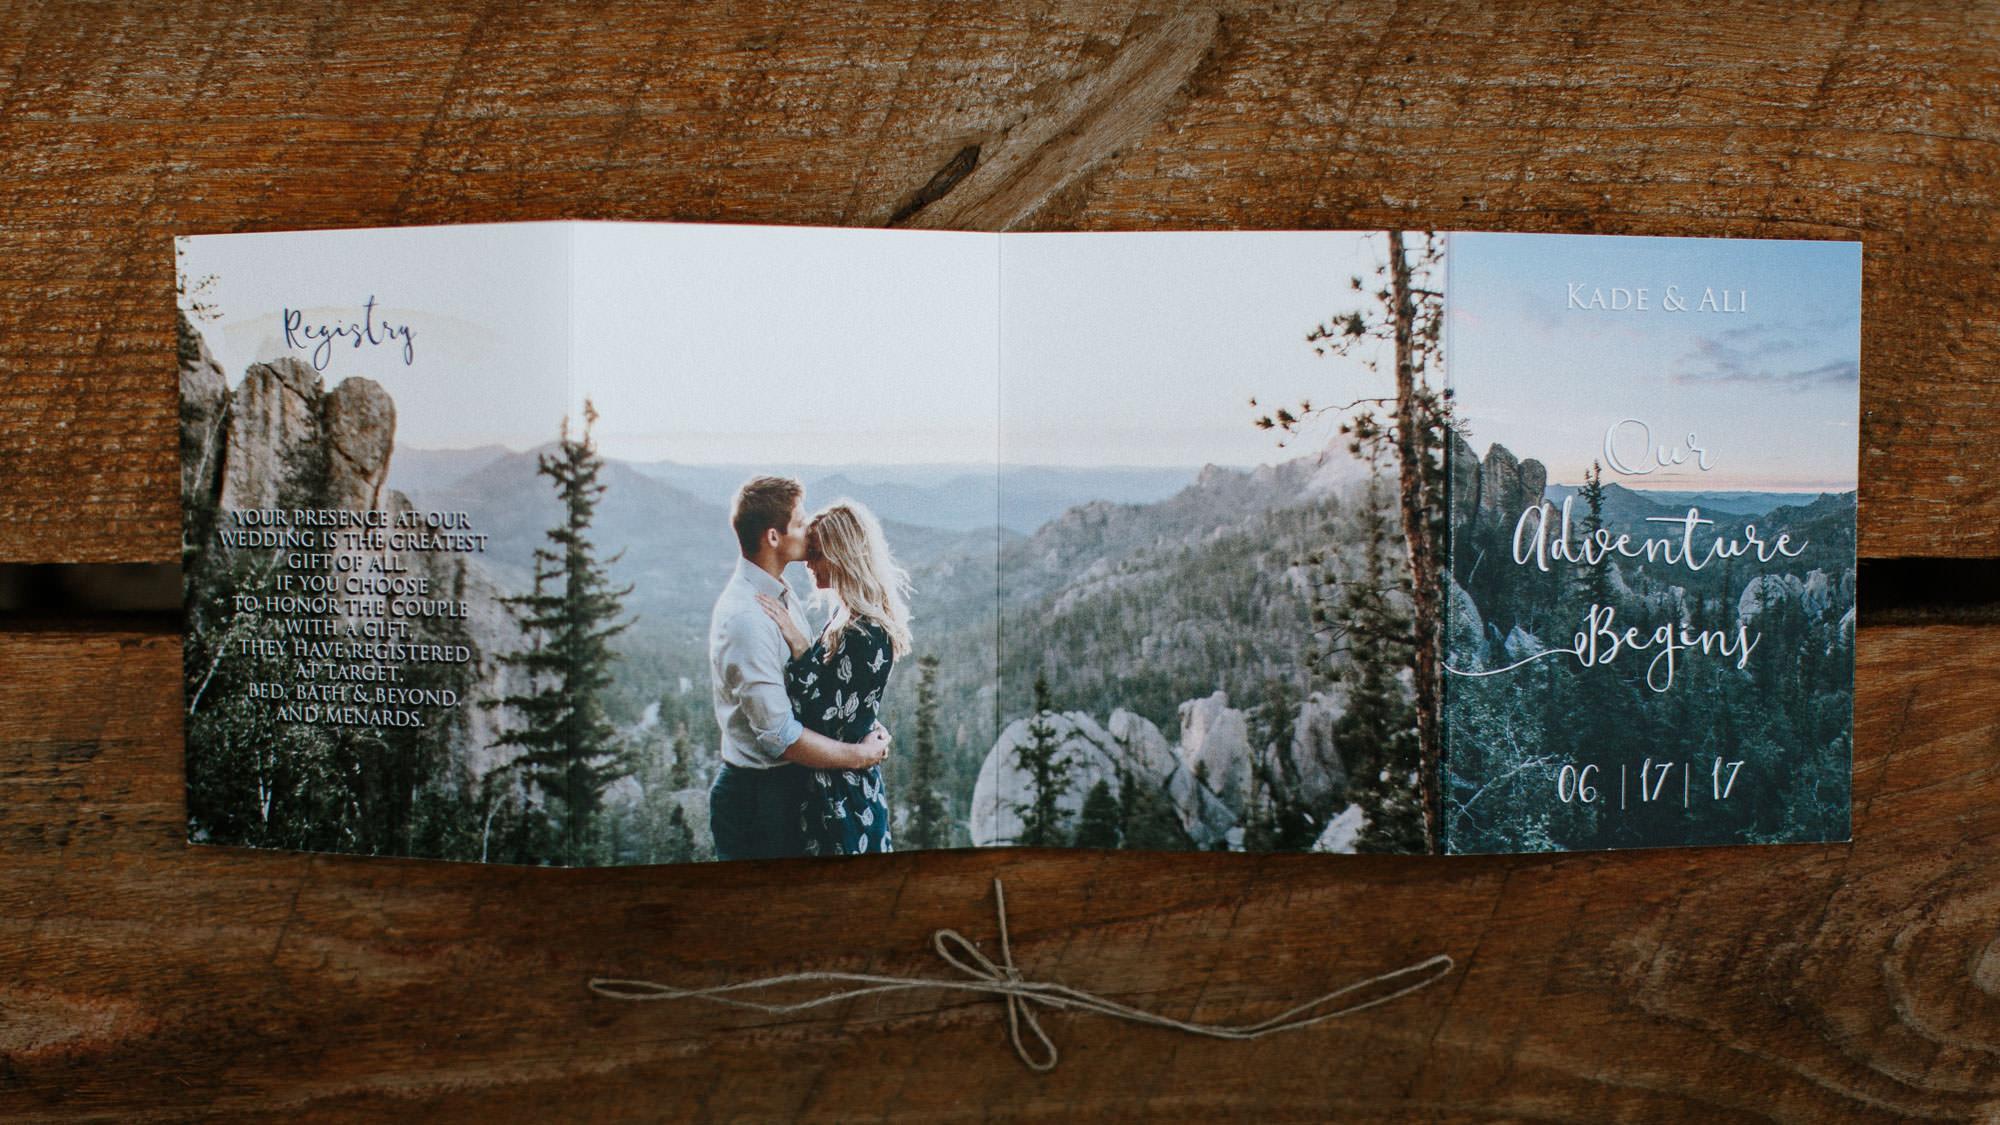 meadow-barn-wedding-sioux-falls-south-dakota-romantic-adventerous-michael-liedtke-photography001.jpg